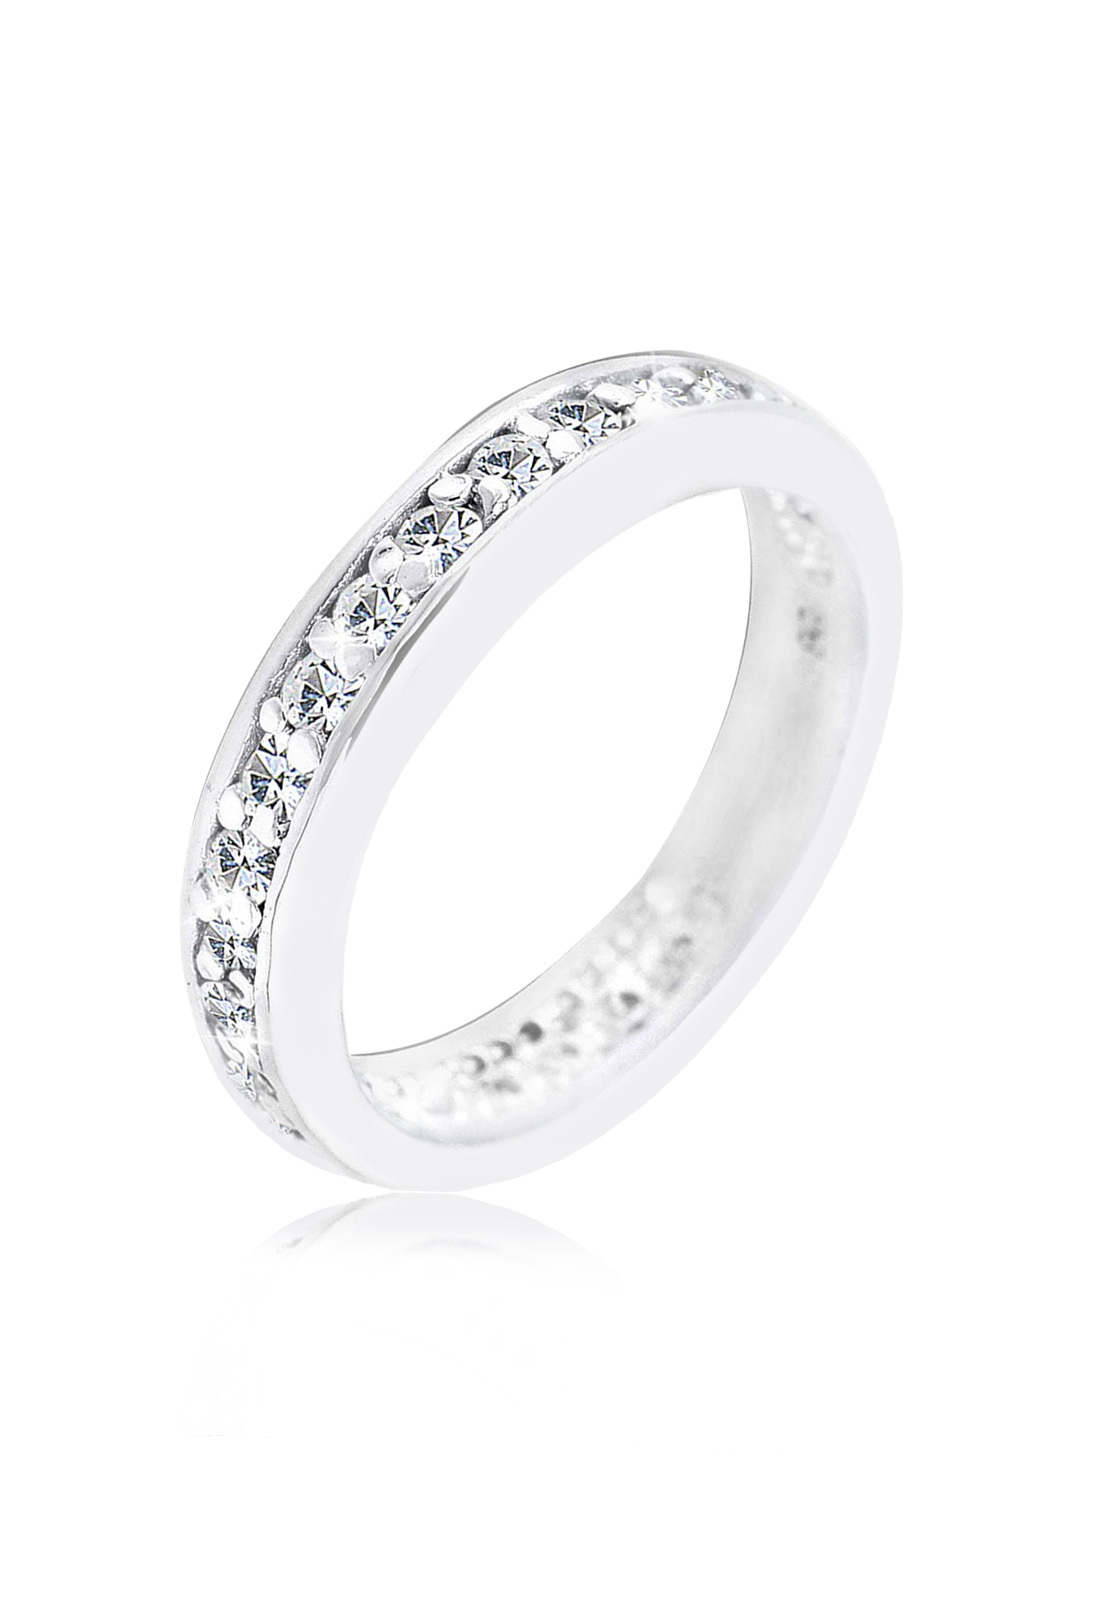 Bandring   Kristall ( Weiß )   925er Sterling Silber